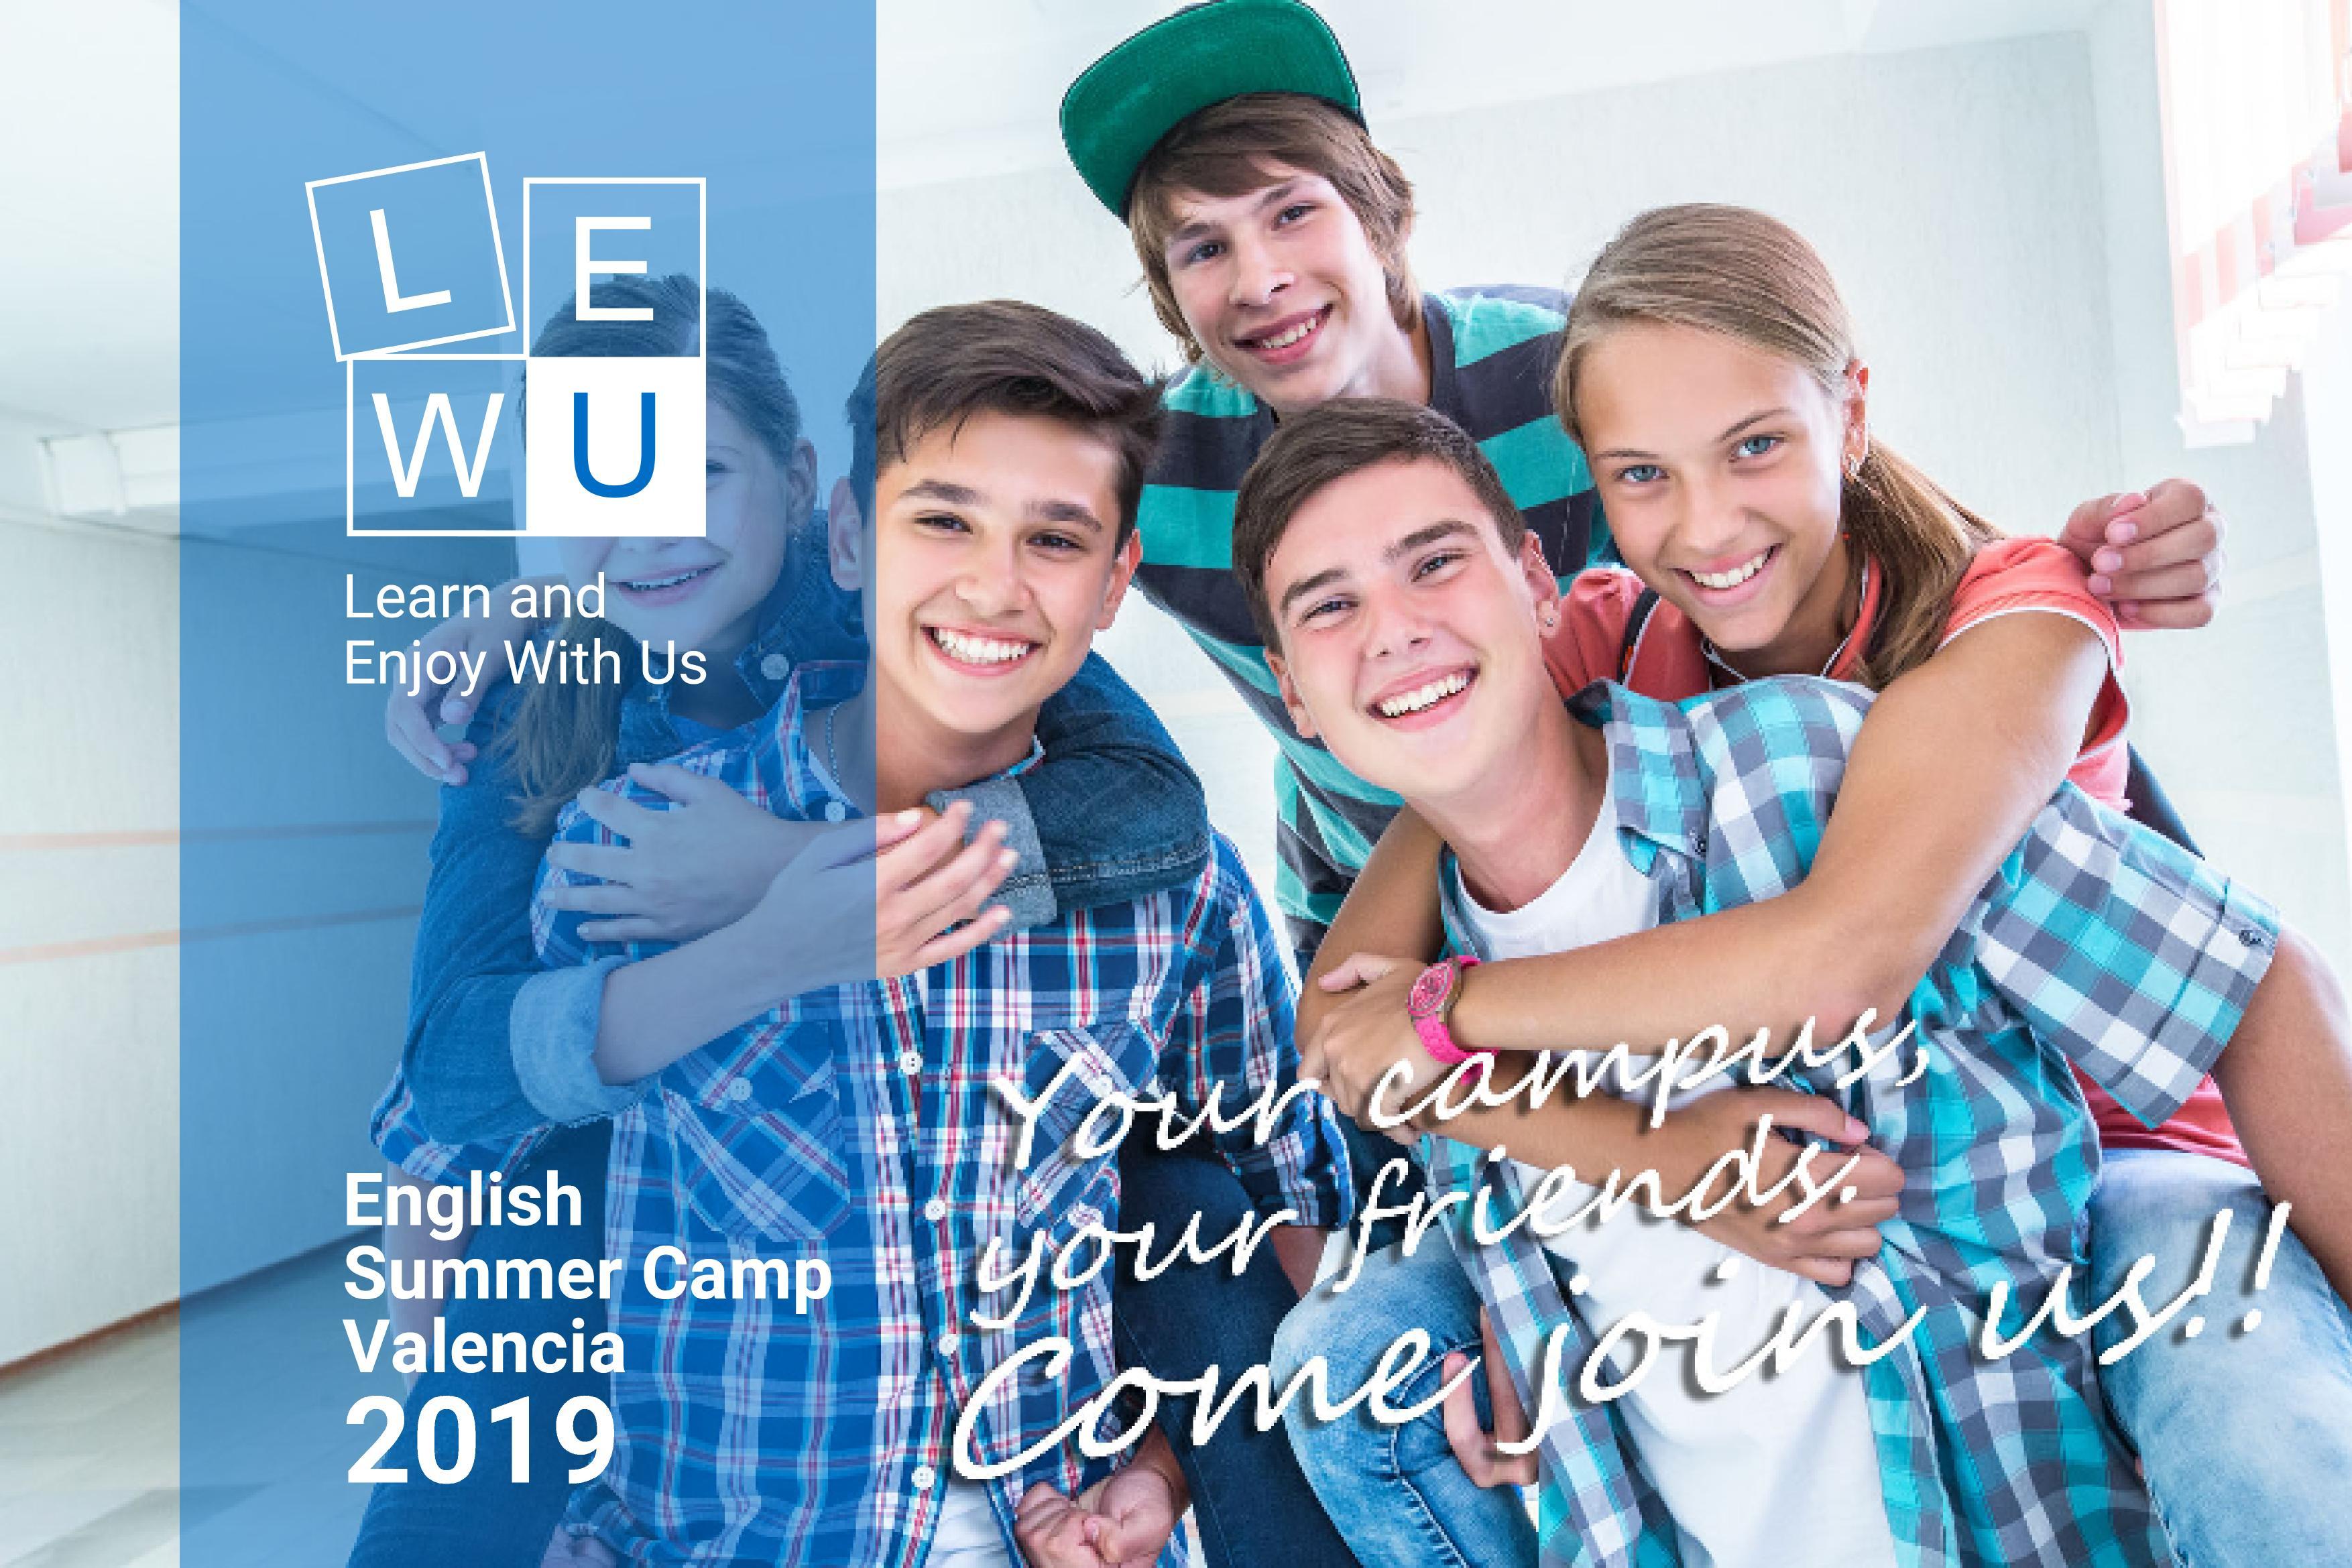 Catálogo Lewu Summer Camp